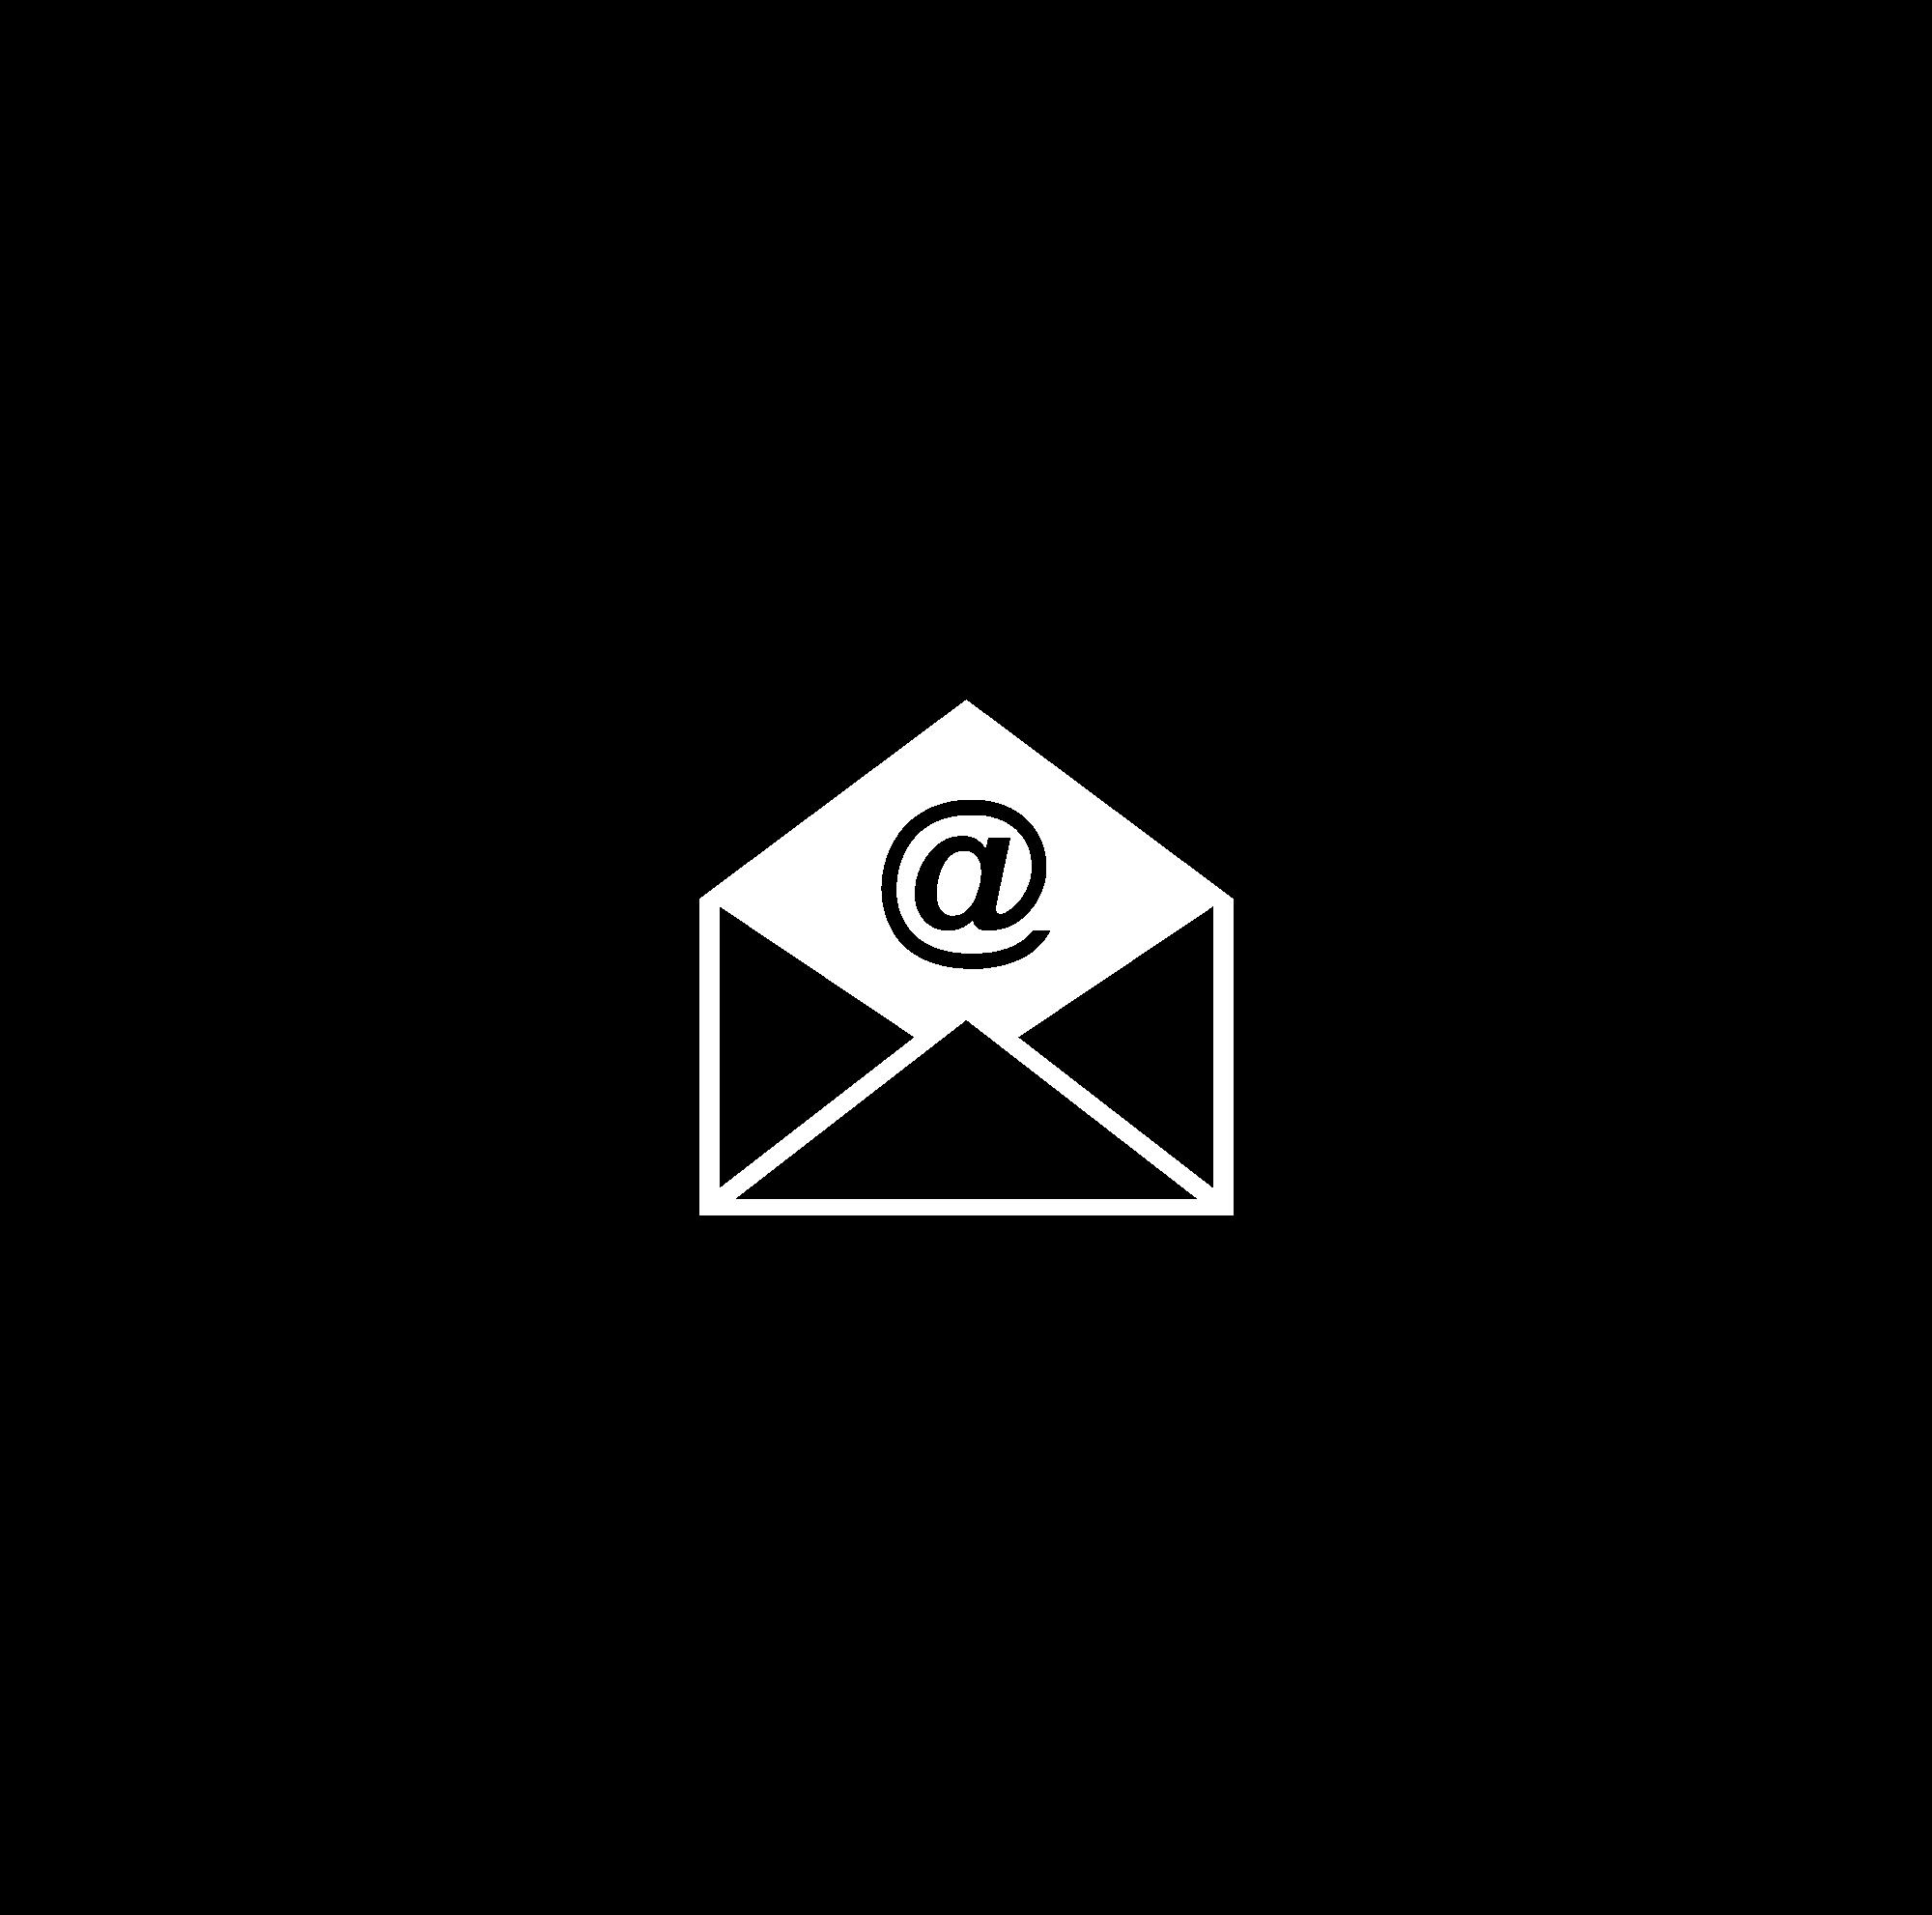 logo-white (2).png